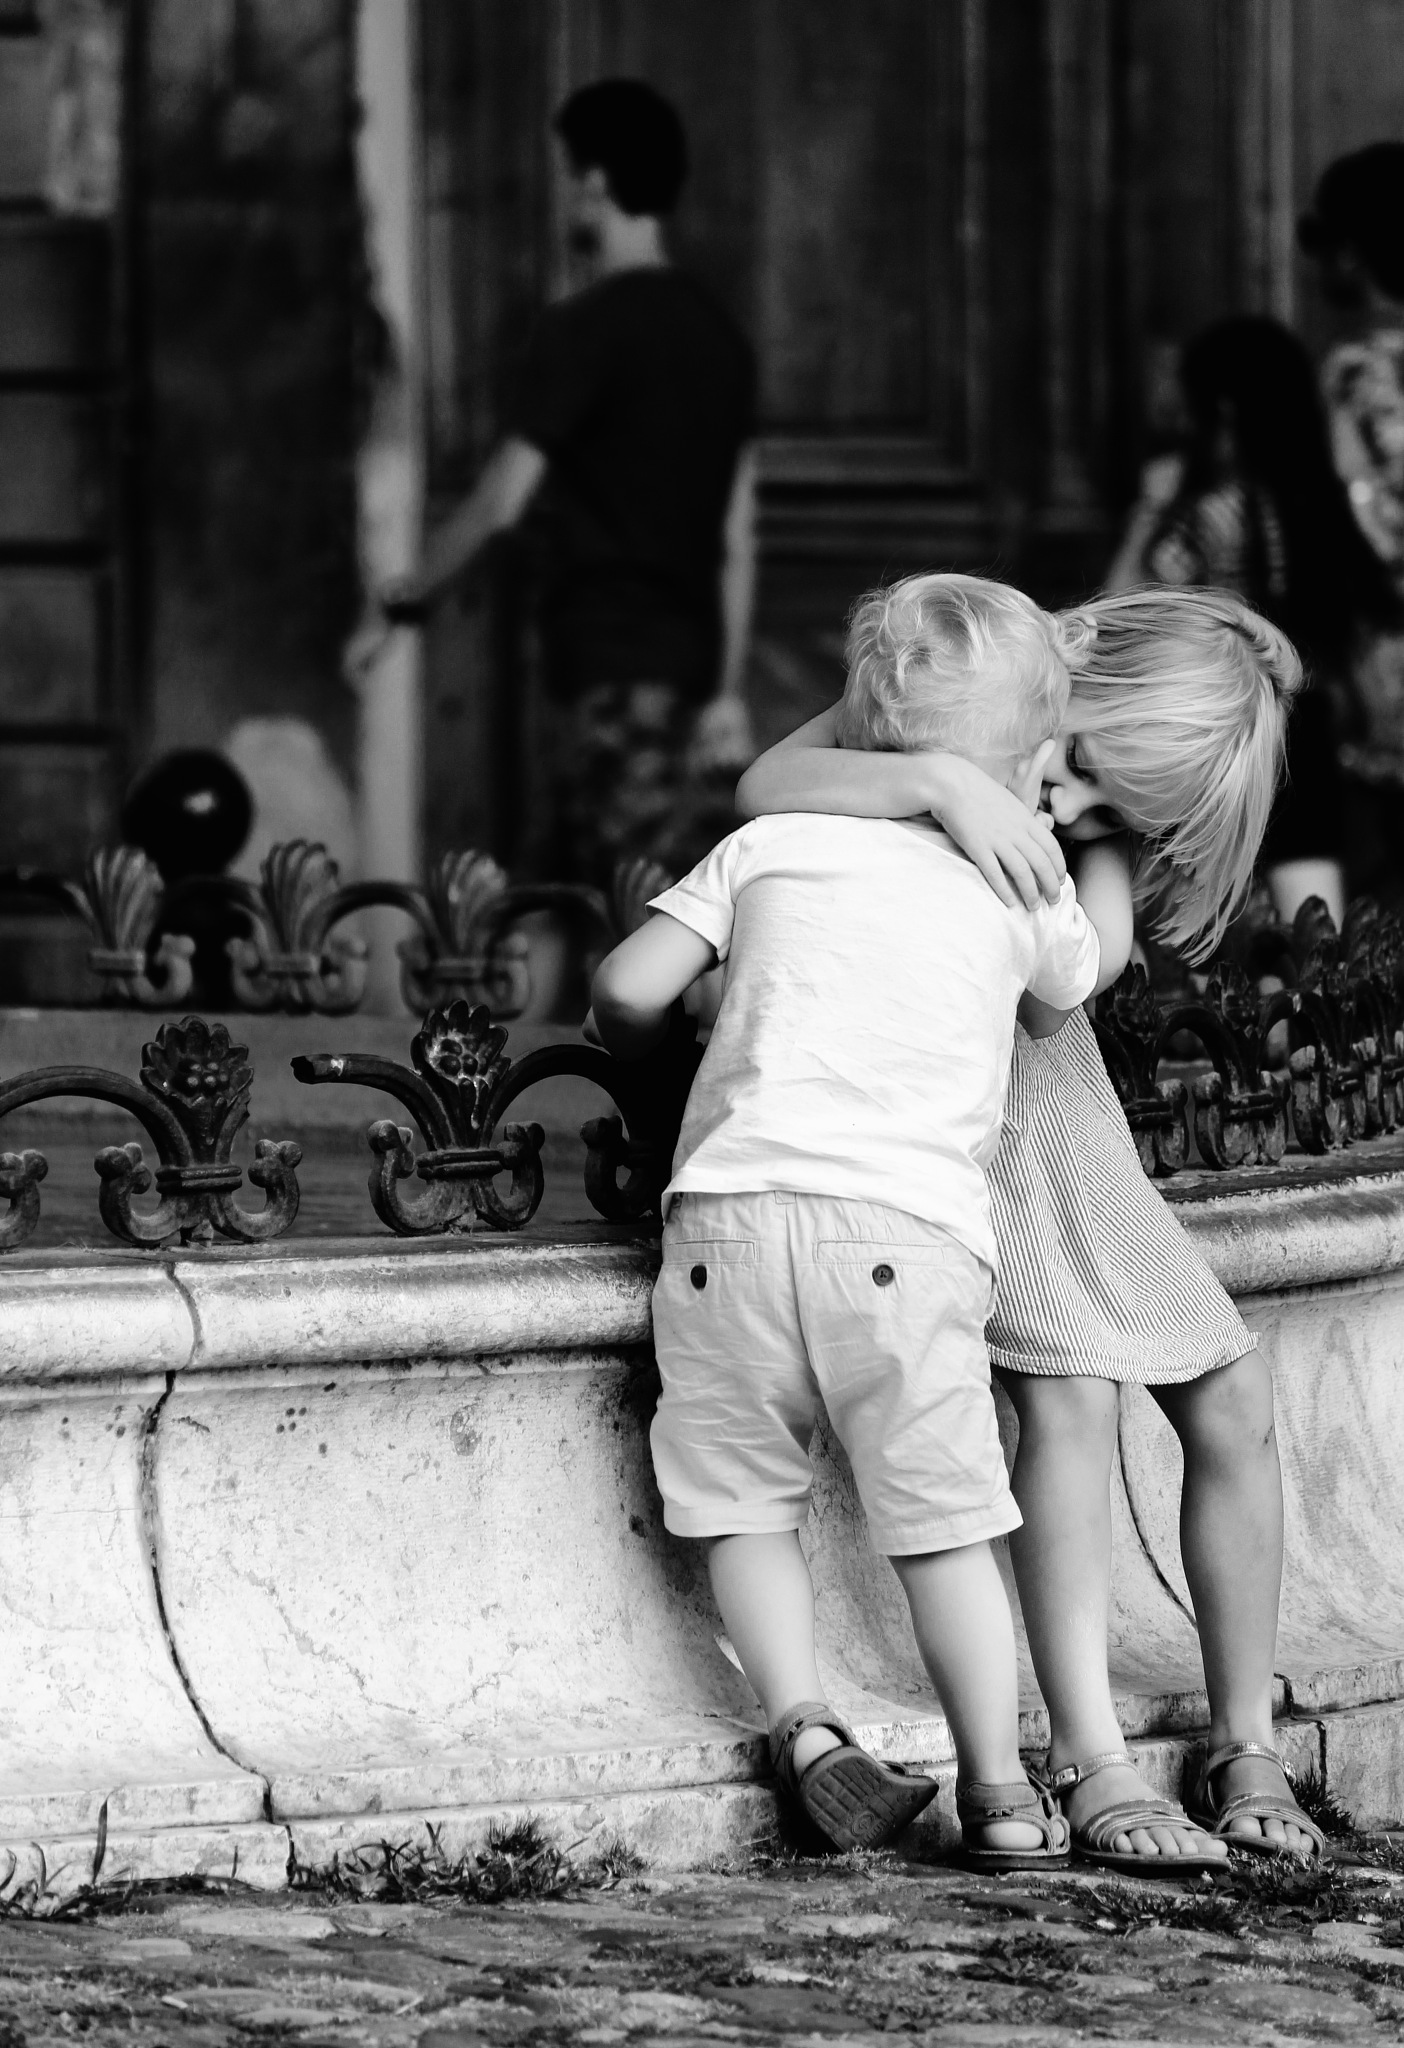 Innocence by Souad Chatta Tibourtine